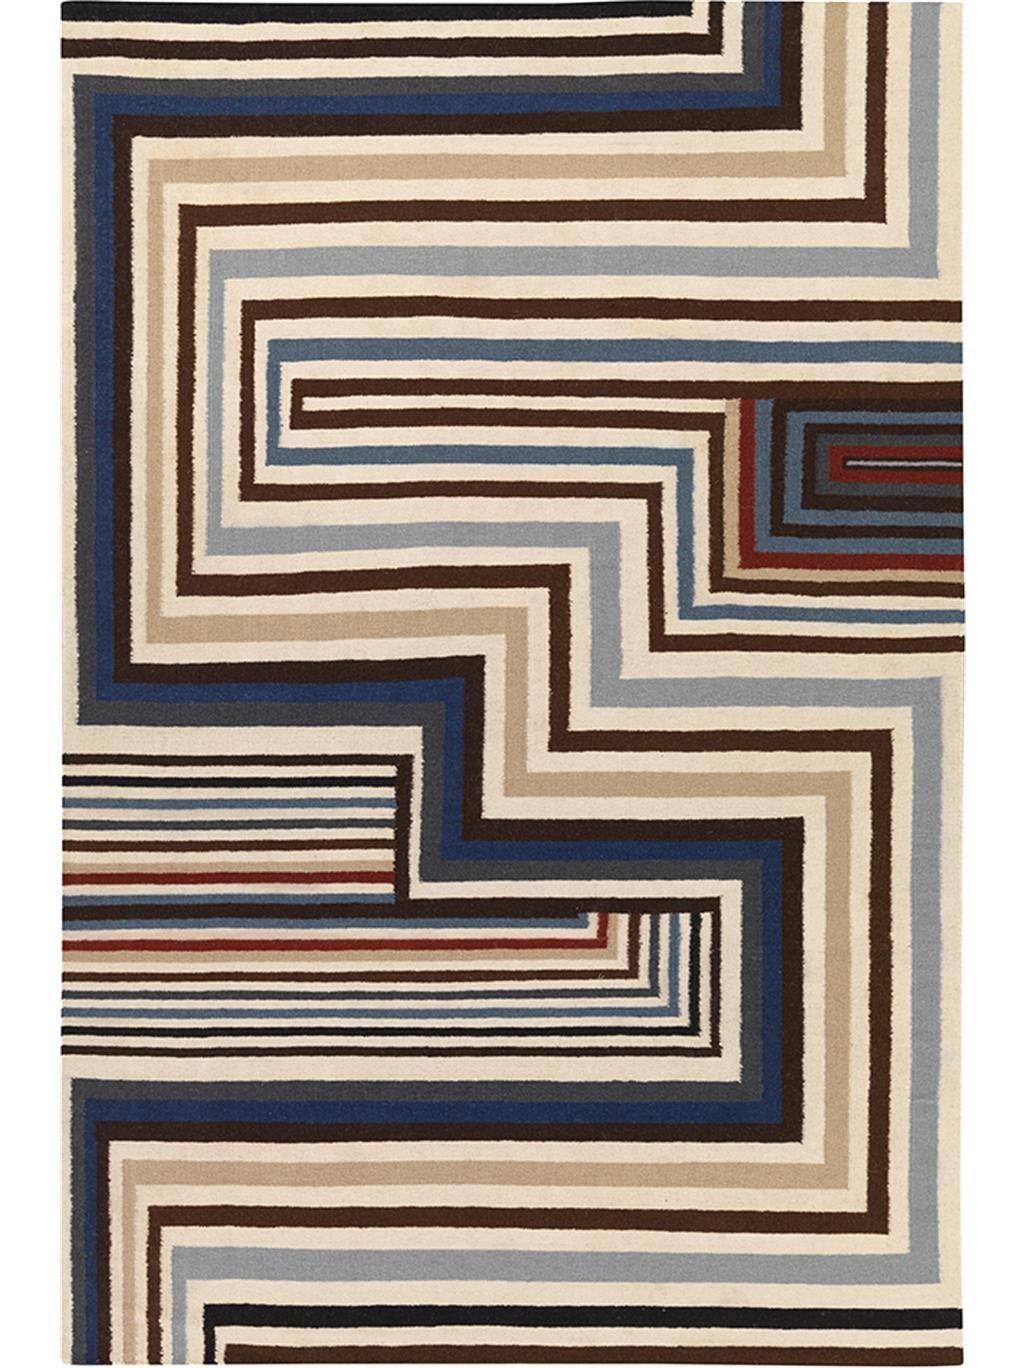 Benuta Teppich teppich abstract malachite benuta teppich christianlacroix